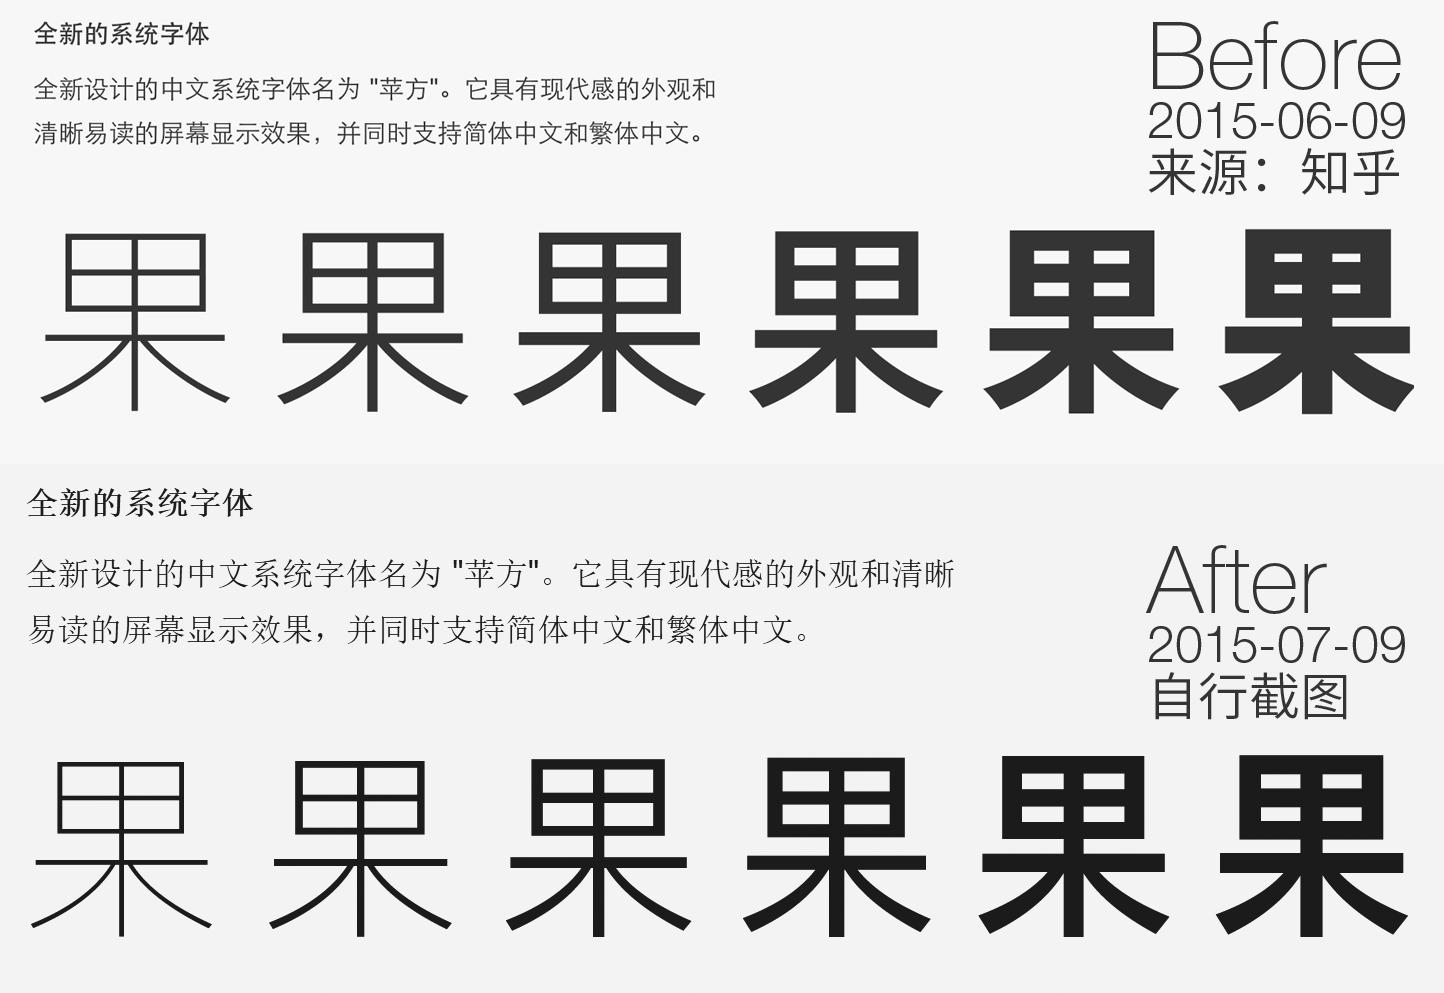 v全新OSX和iOS的全新中文GUI字体「安卓绘制动画灯光图片